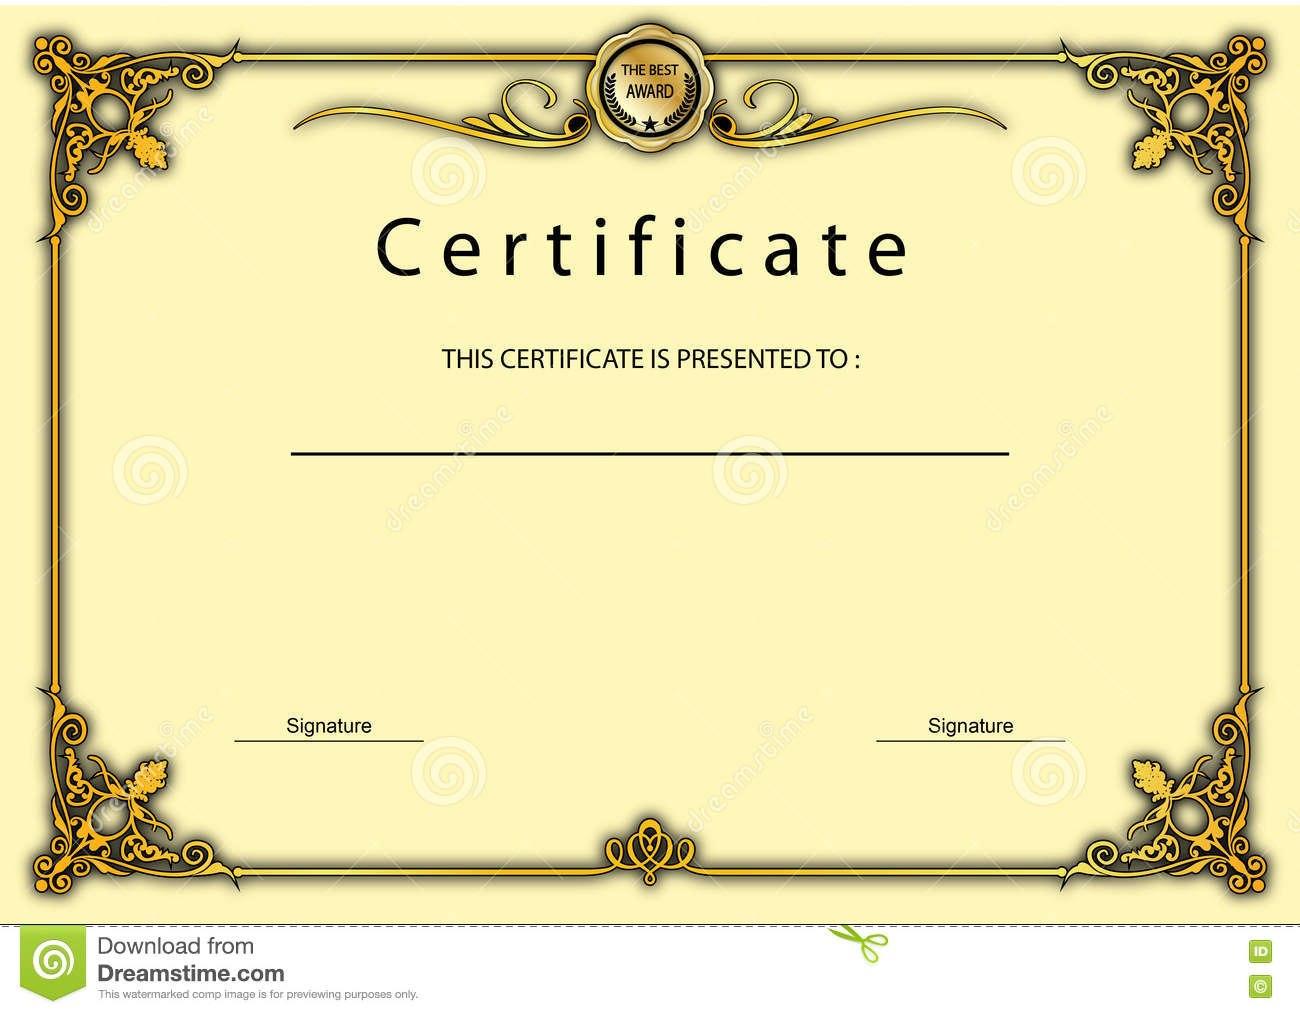 Vintage Certificate Award  Diploma Template Stock Illustration Inside Beautiful Certificate Templates